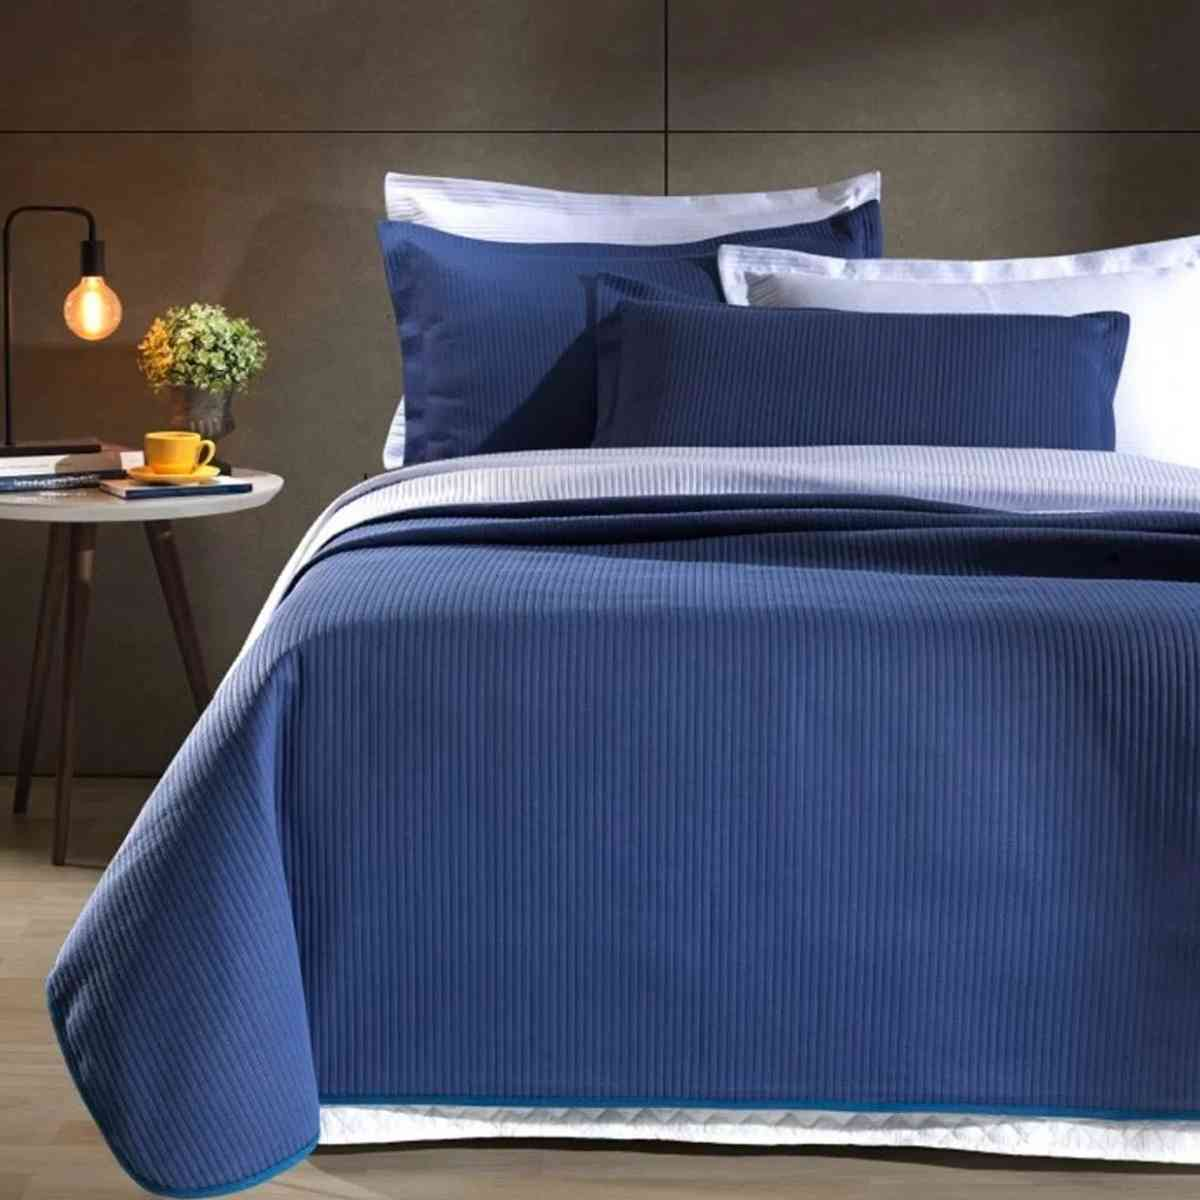 Kit: Cobre leito Colcha Queen Neomalha Ultra Soft Matelassê + 2 Porta Travesseiros Azul